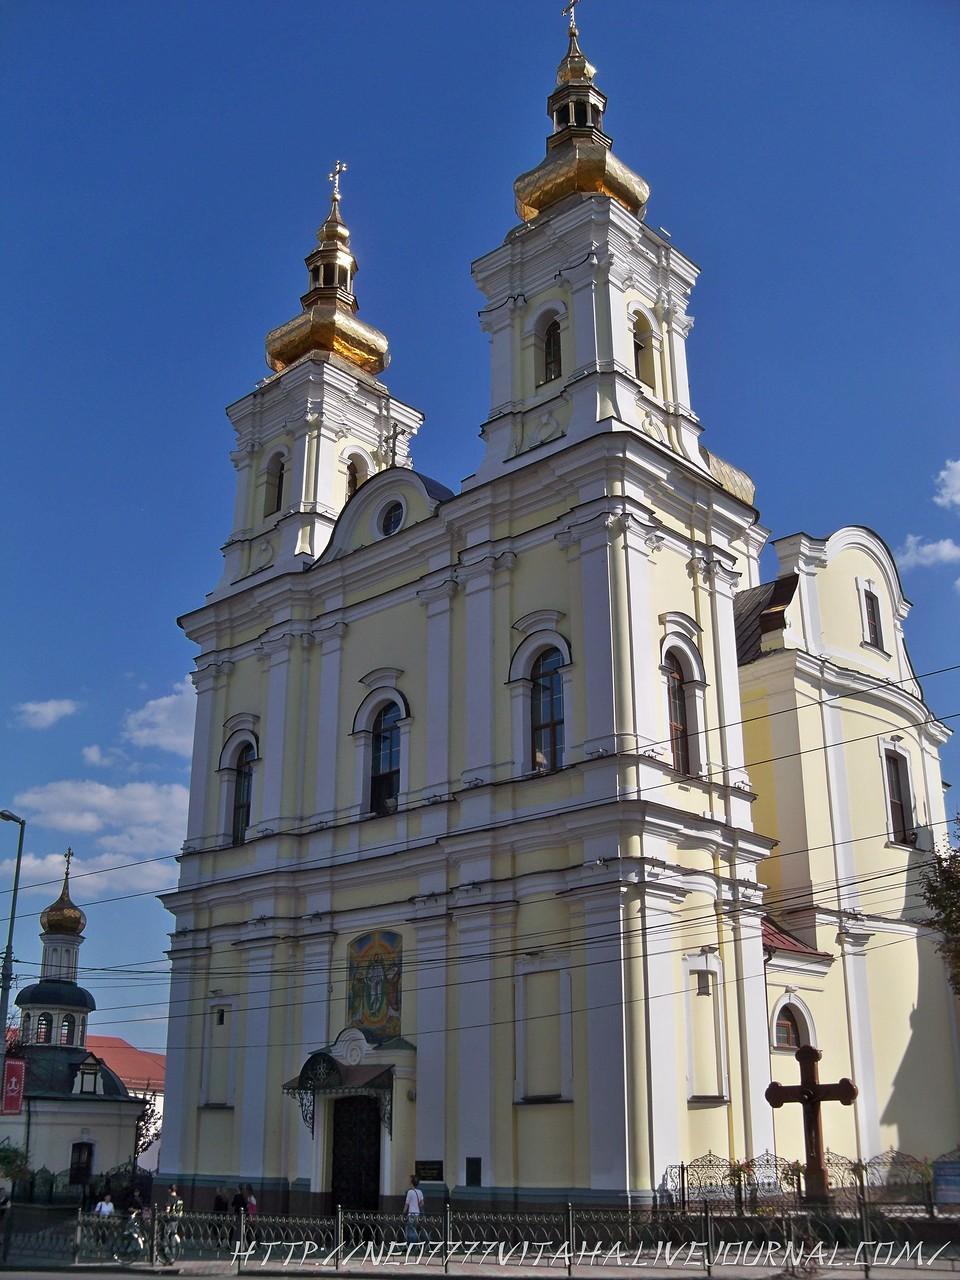 Take A Walk And See The Main Sights Of Vinnitsa 183 Ukraine